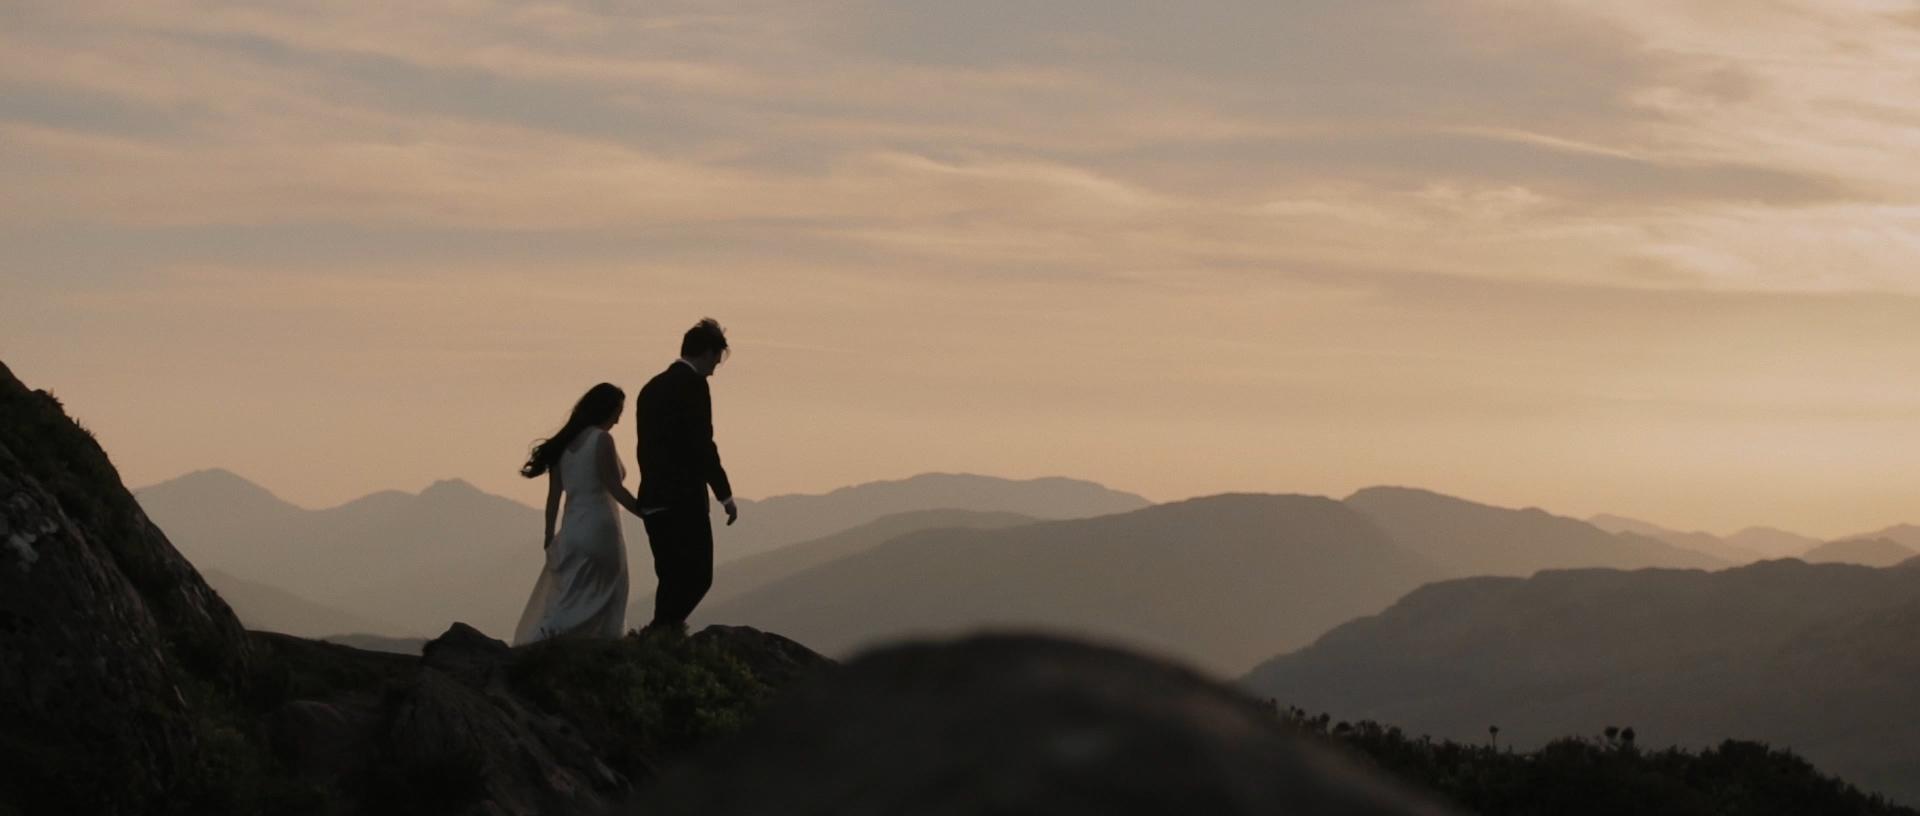 cardross-estate-wedding-videographer_LL_01.jpg